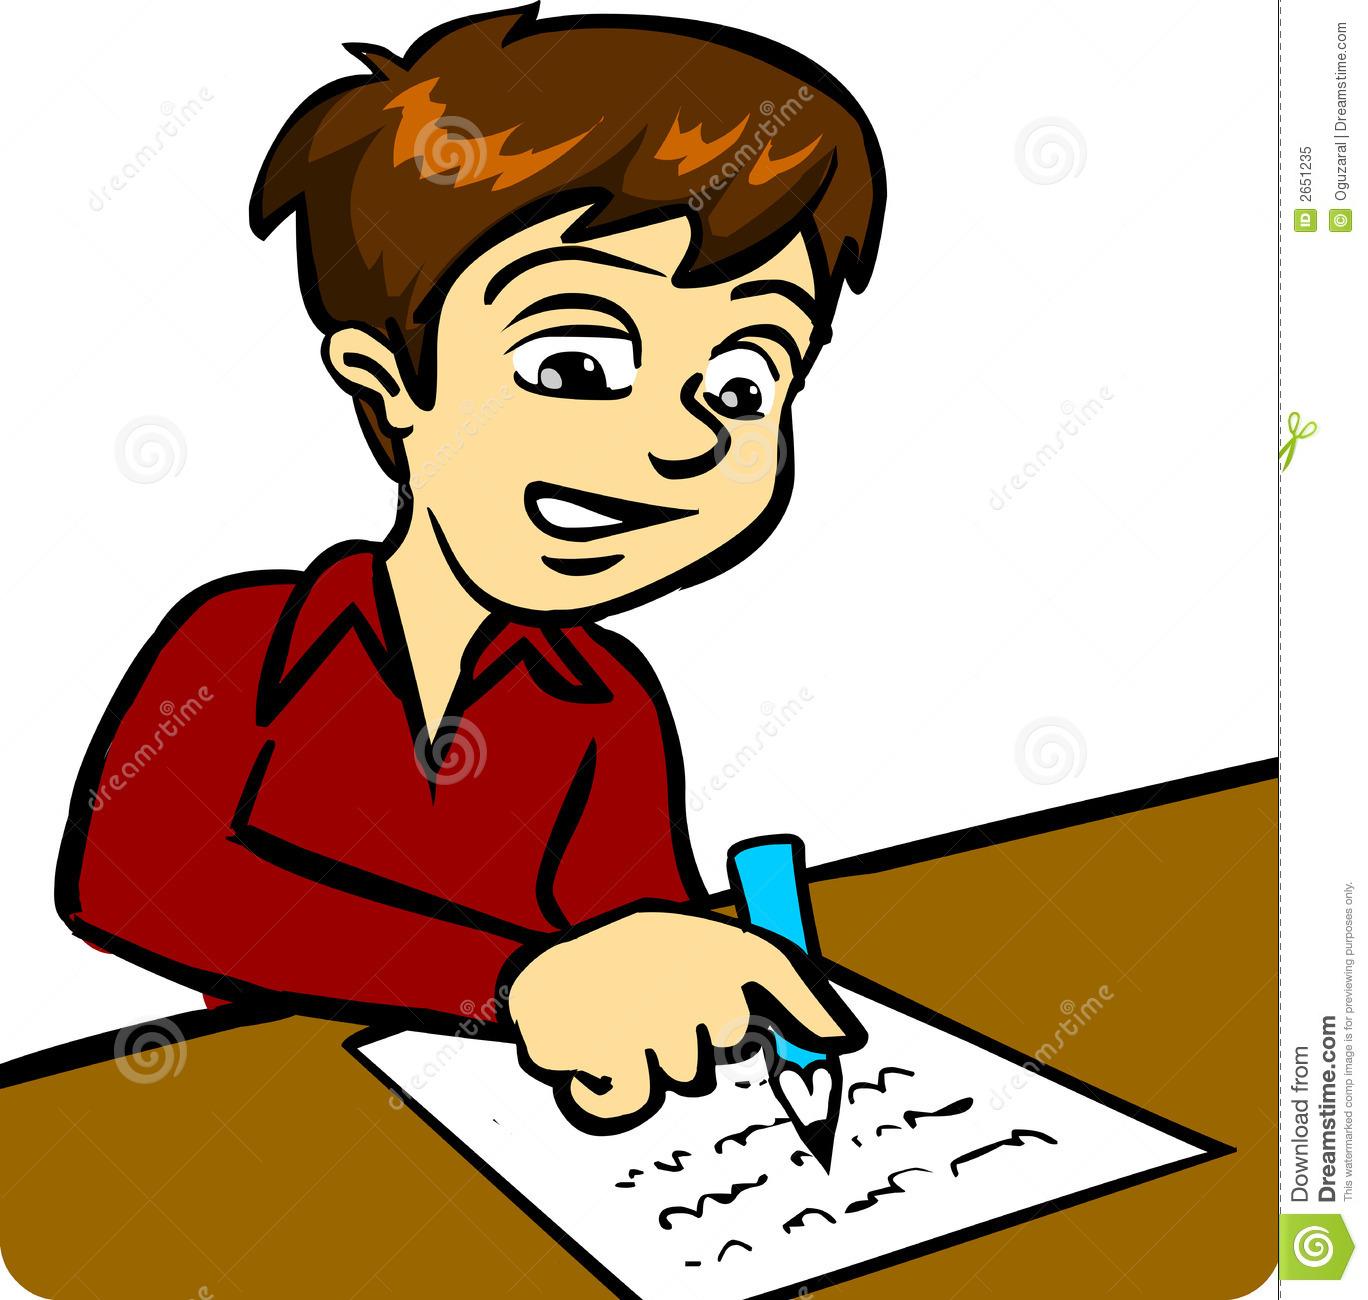 Clip Art Clipart Writing writing a letter clipart kid girl boy 2651235 jpg